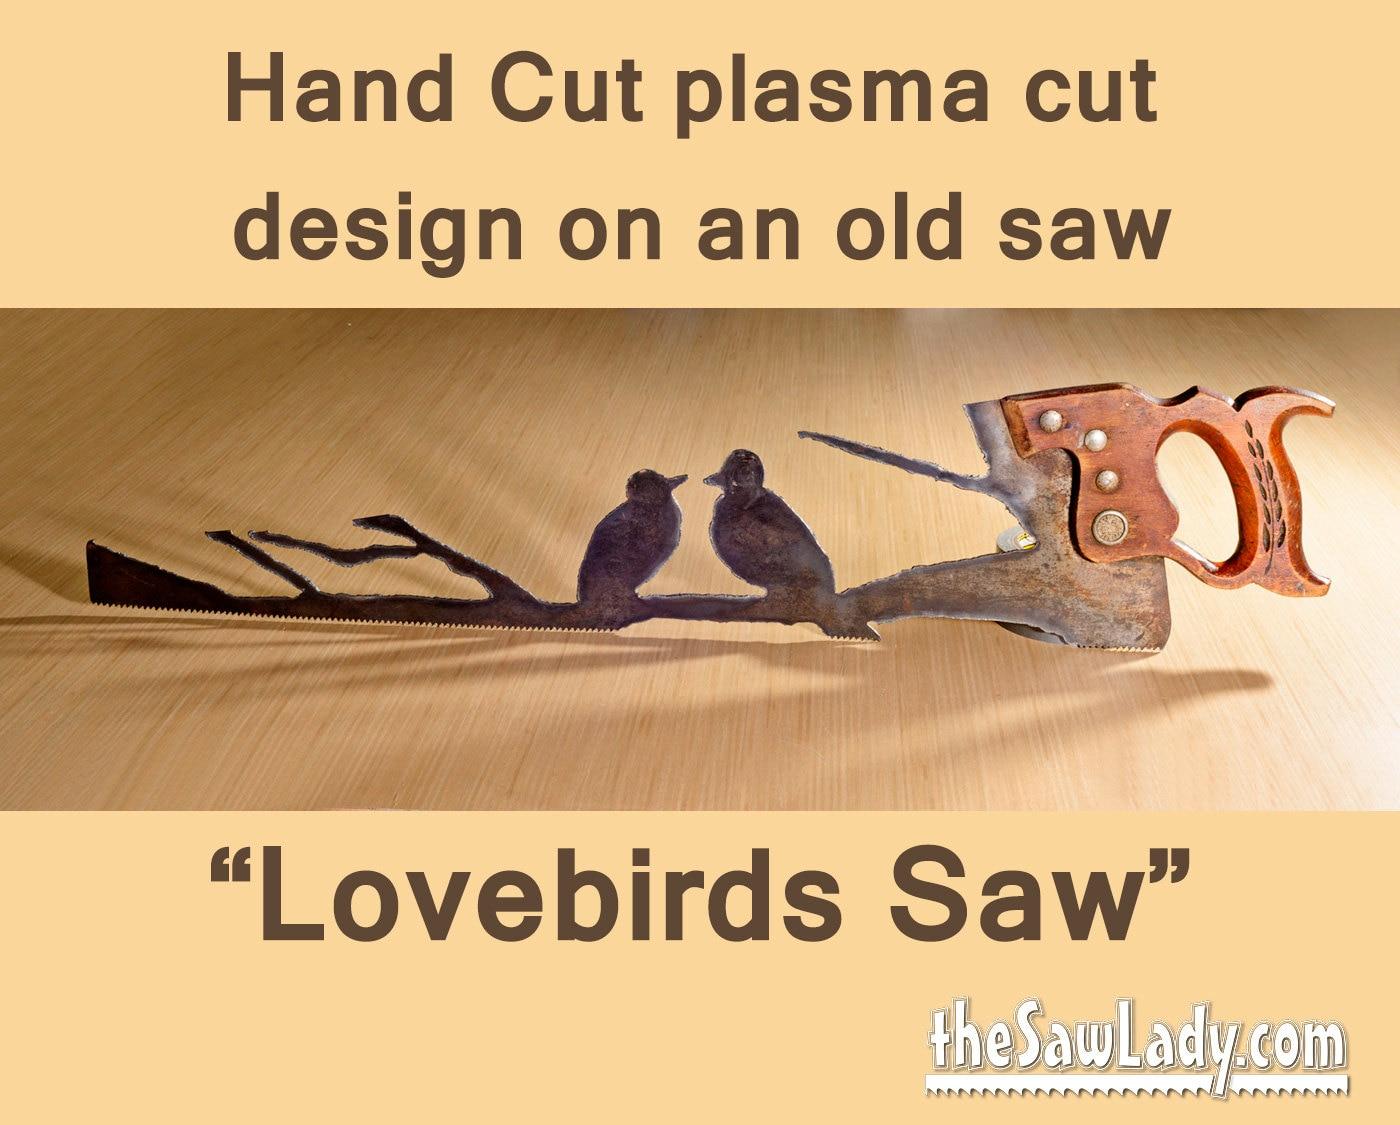 Metal Art Lovebirds design Hand plasma cut handsaw Wall